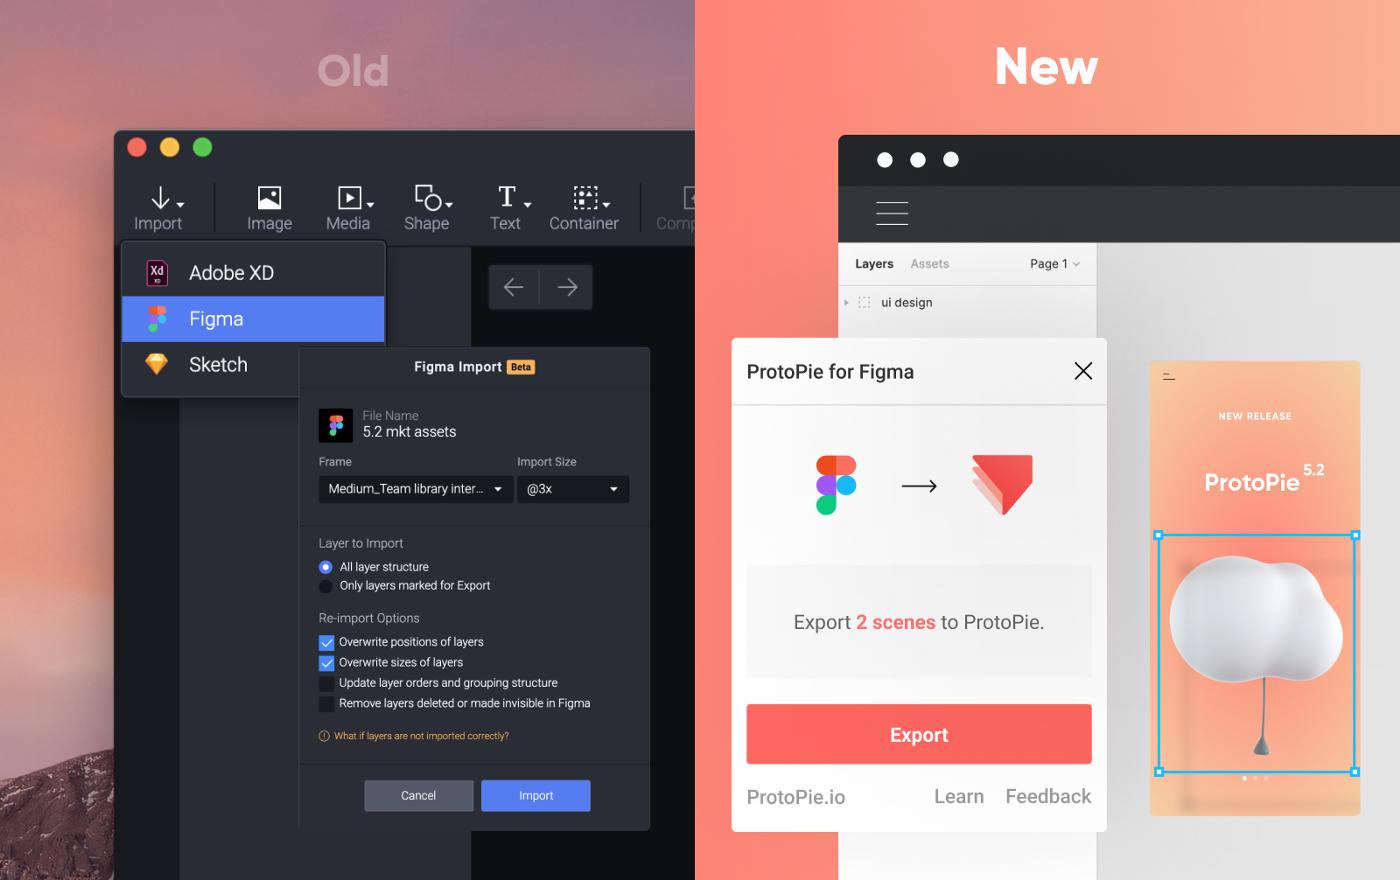 legacy Figma import vs new